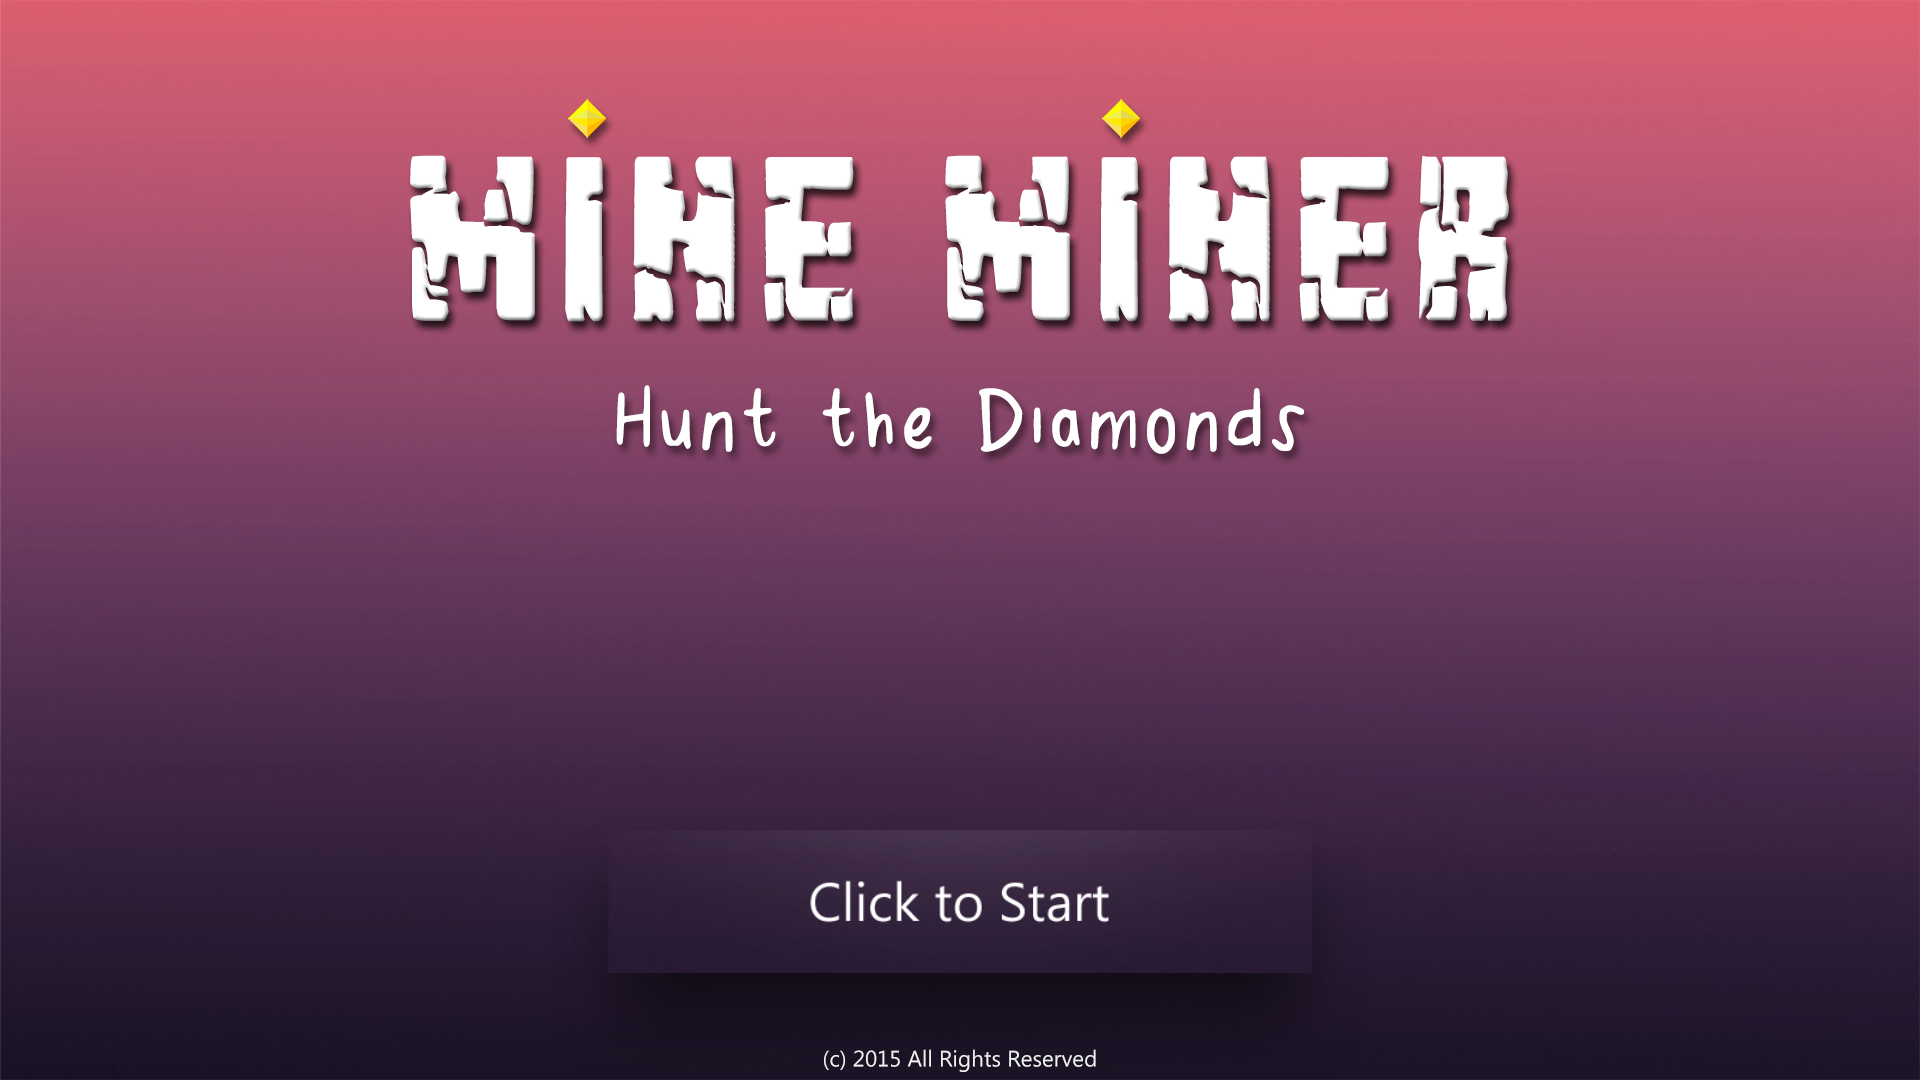 Mine Miner - Hunt the Diamonds! screenshot 1